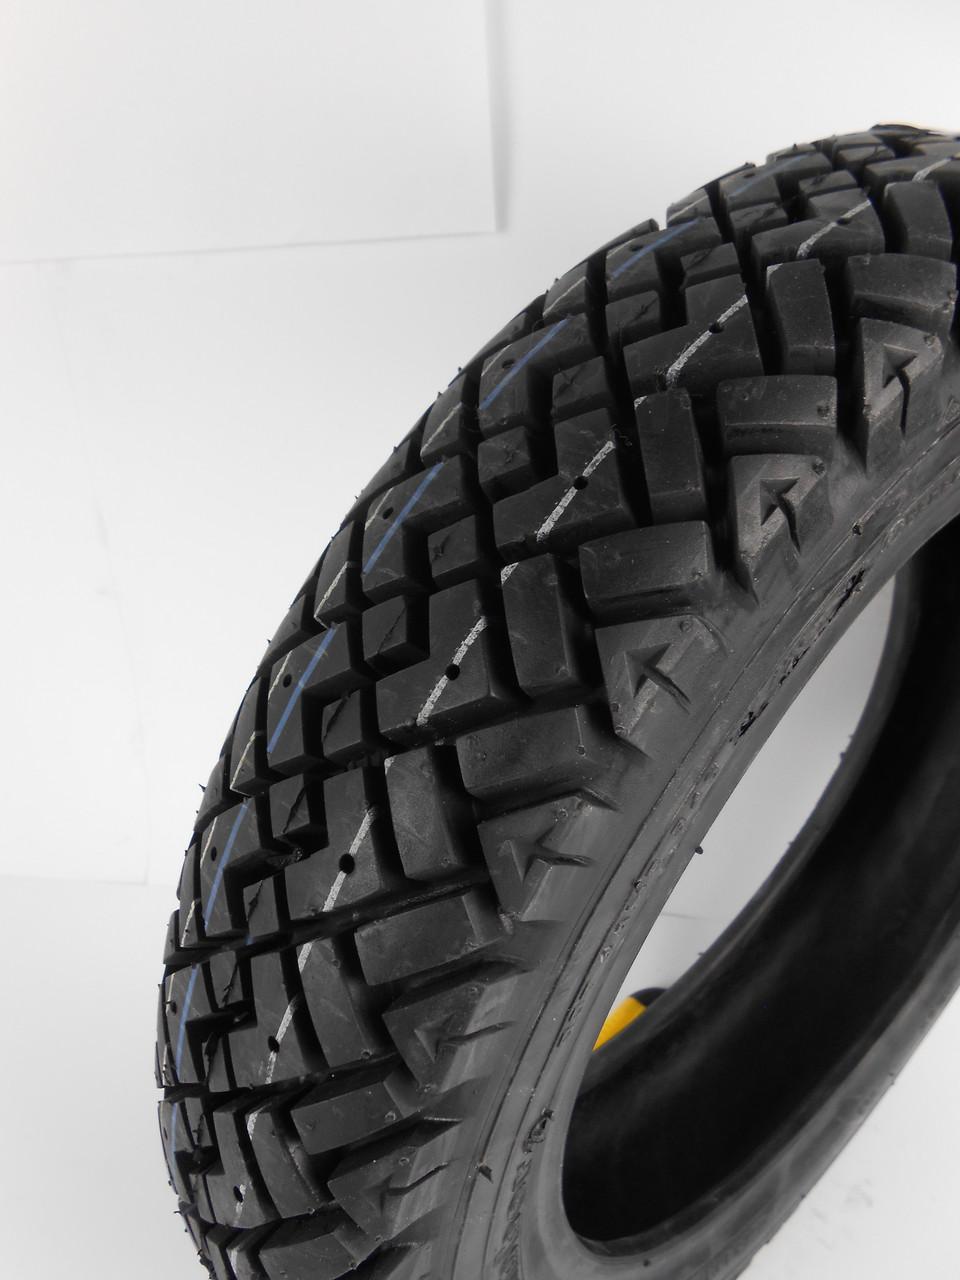 Покрышка мото шины Vee Rubber VRM-346 3.00-10, TL зимняя